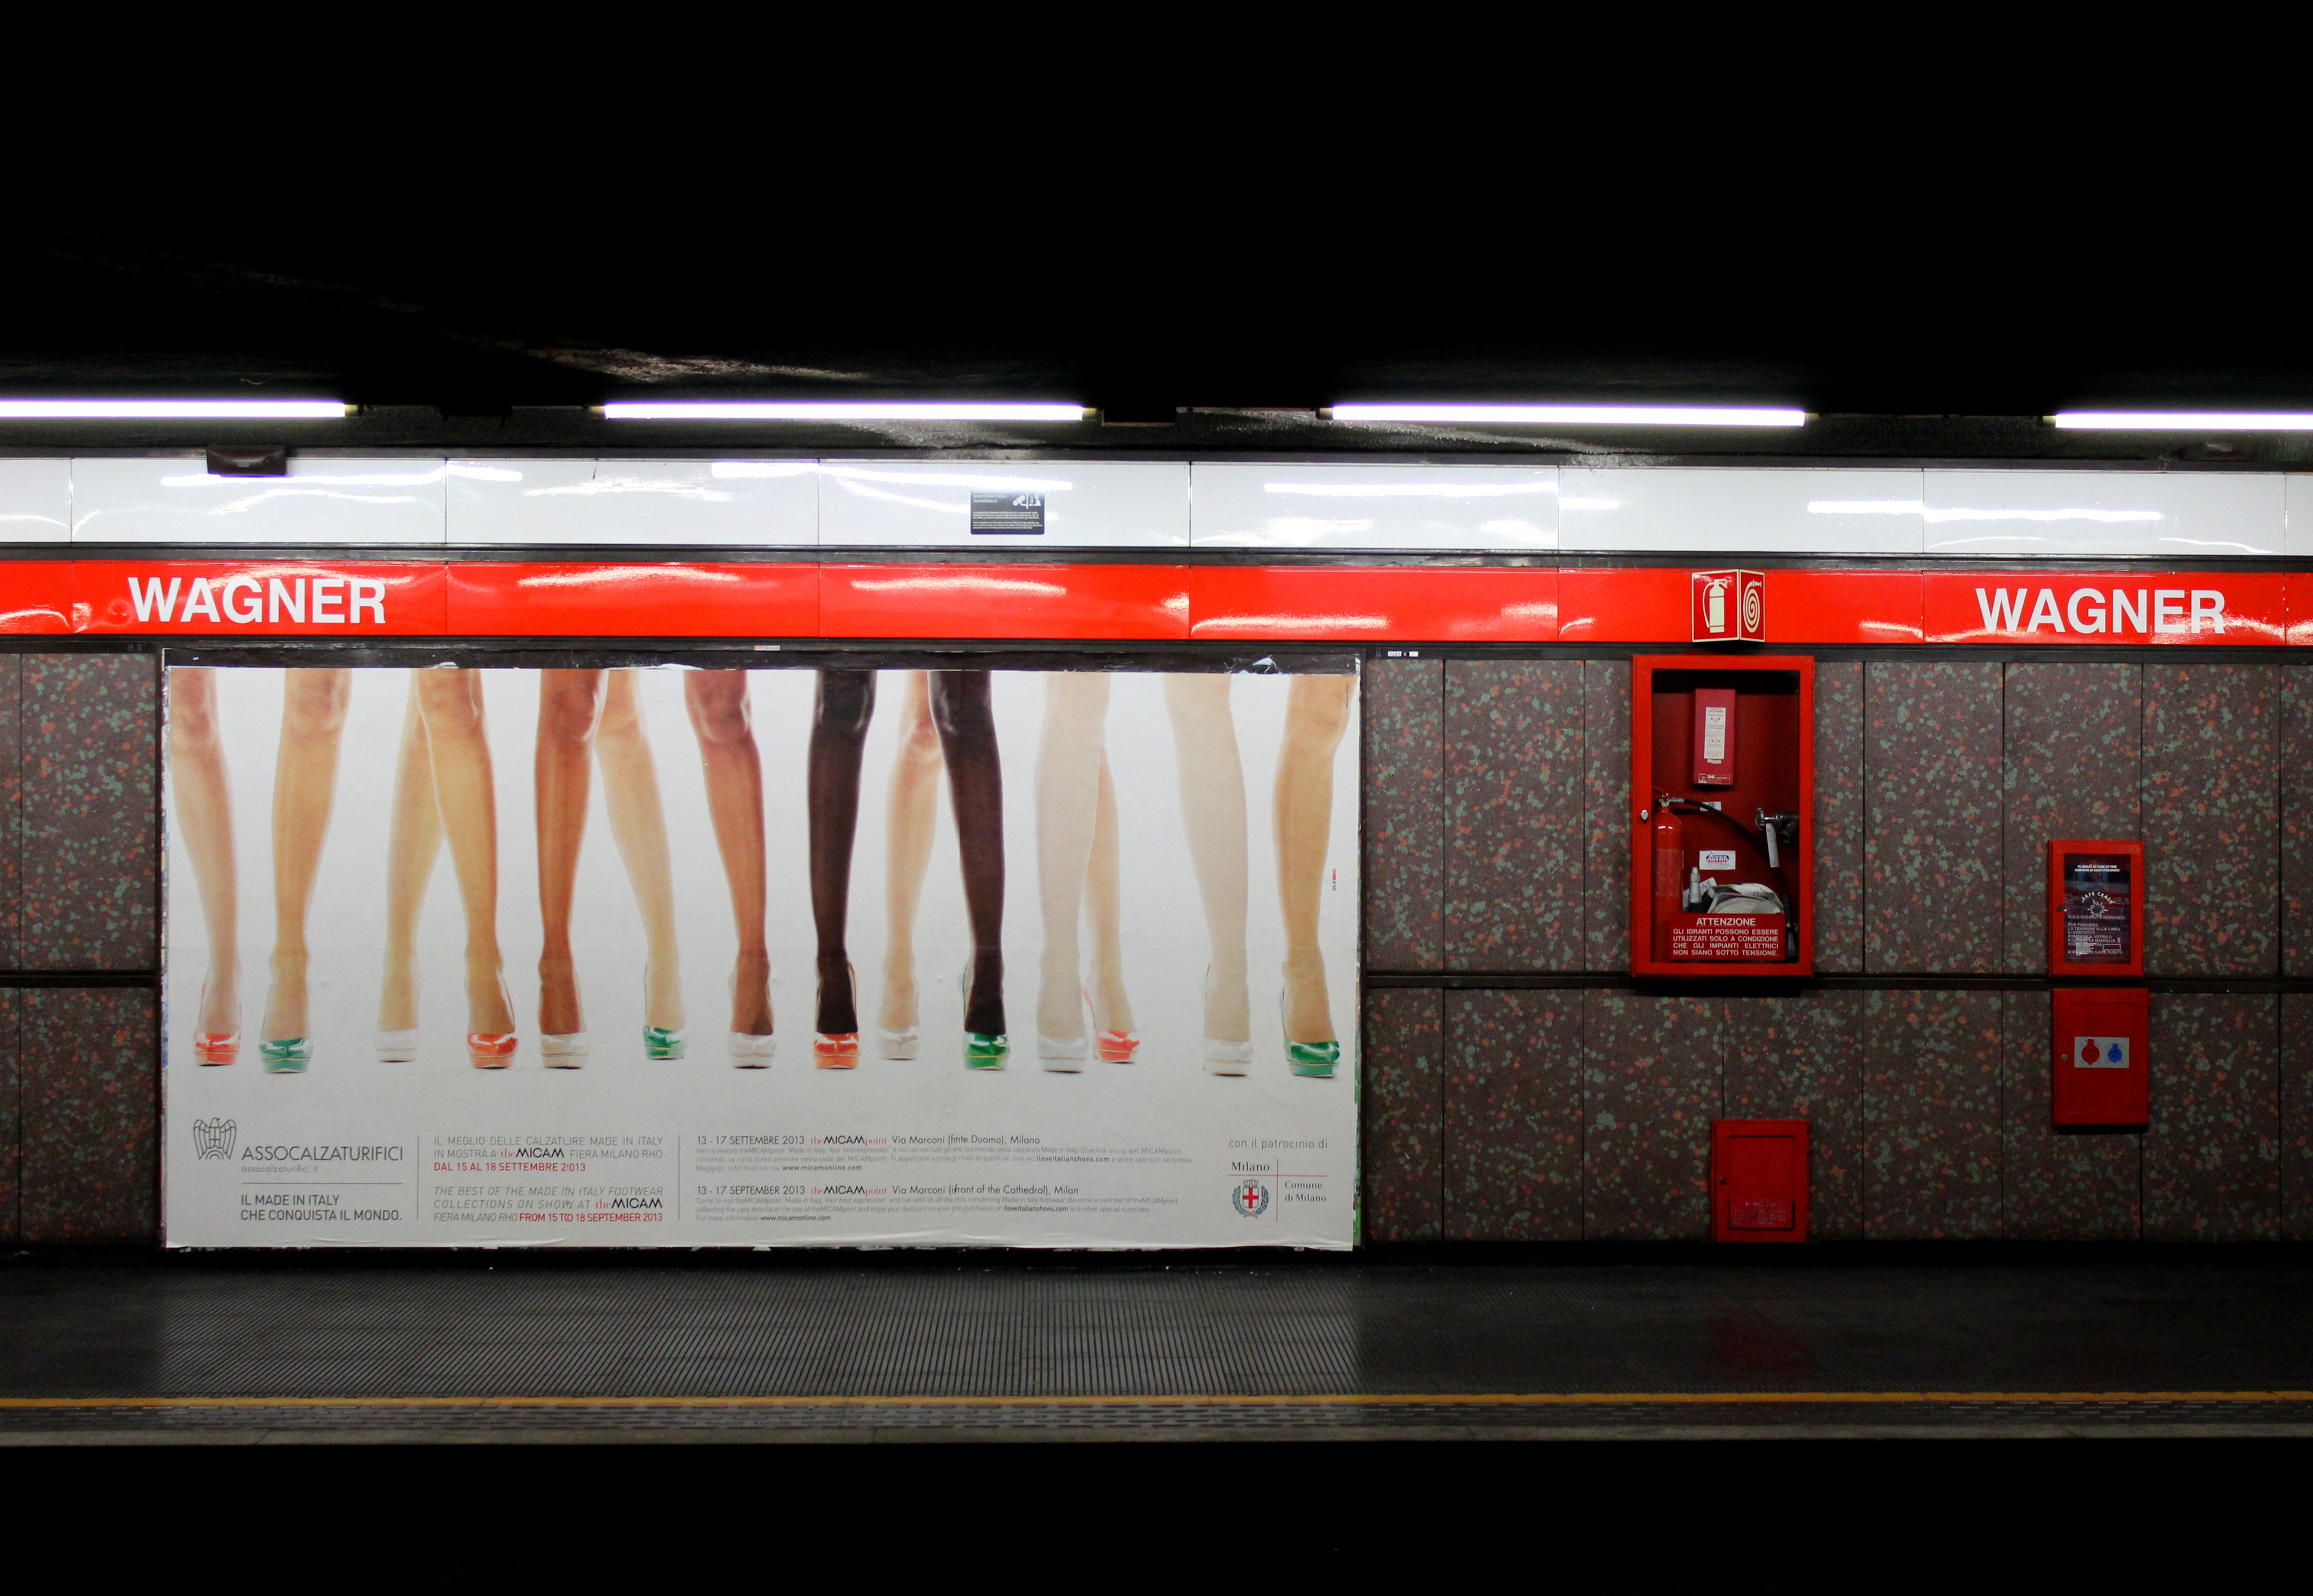 File Milano Metropolitana Wagner Jpg Wikimedia Commons